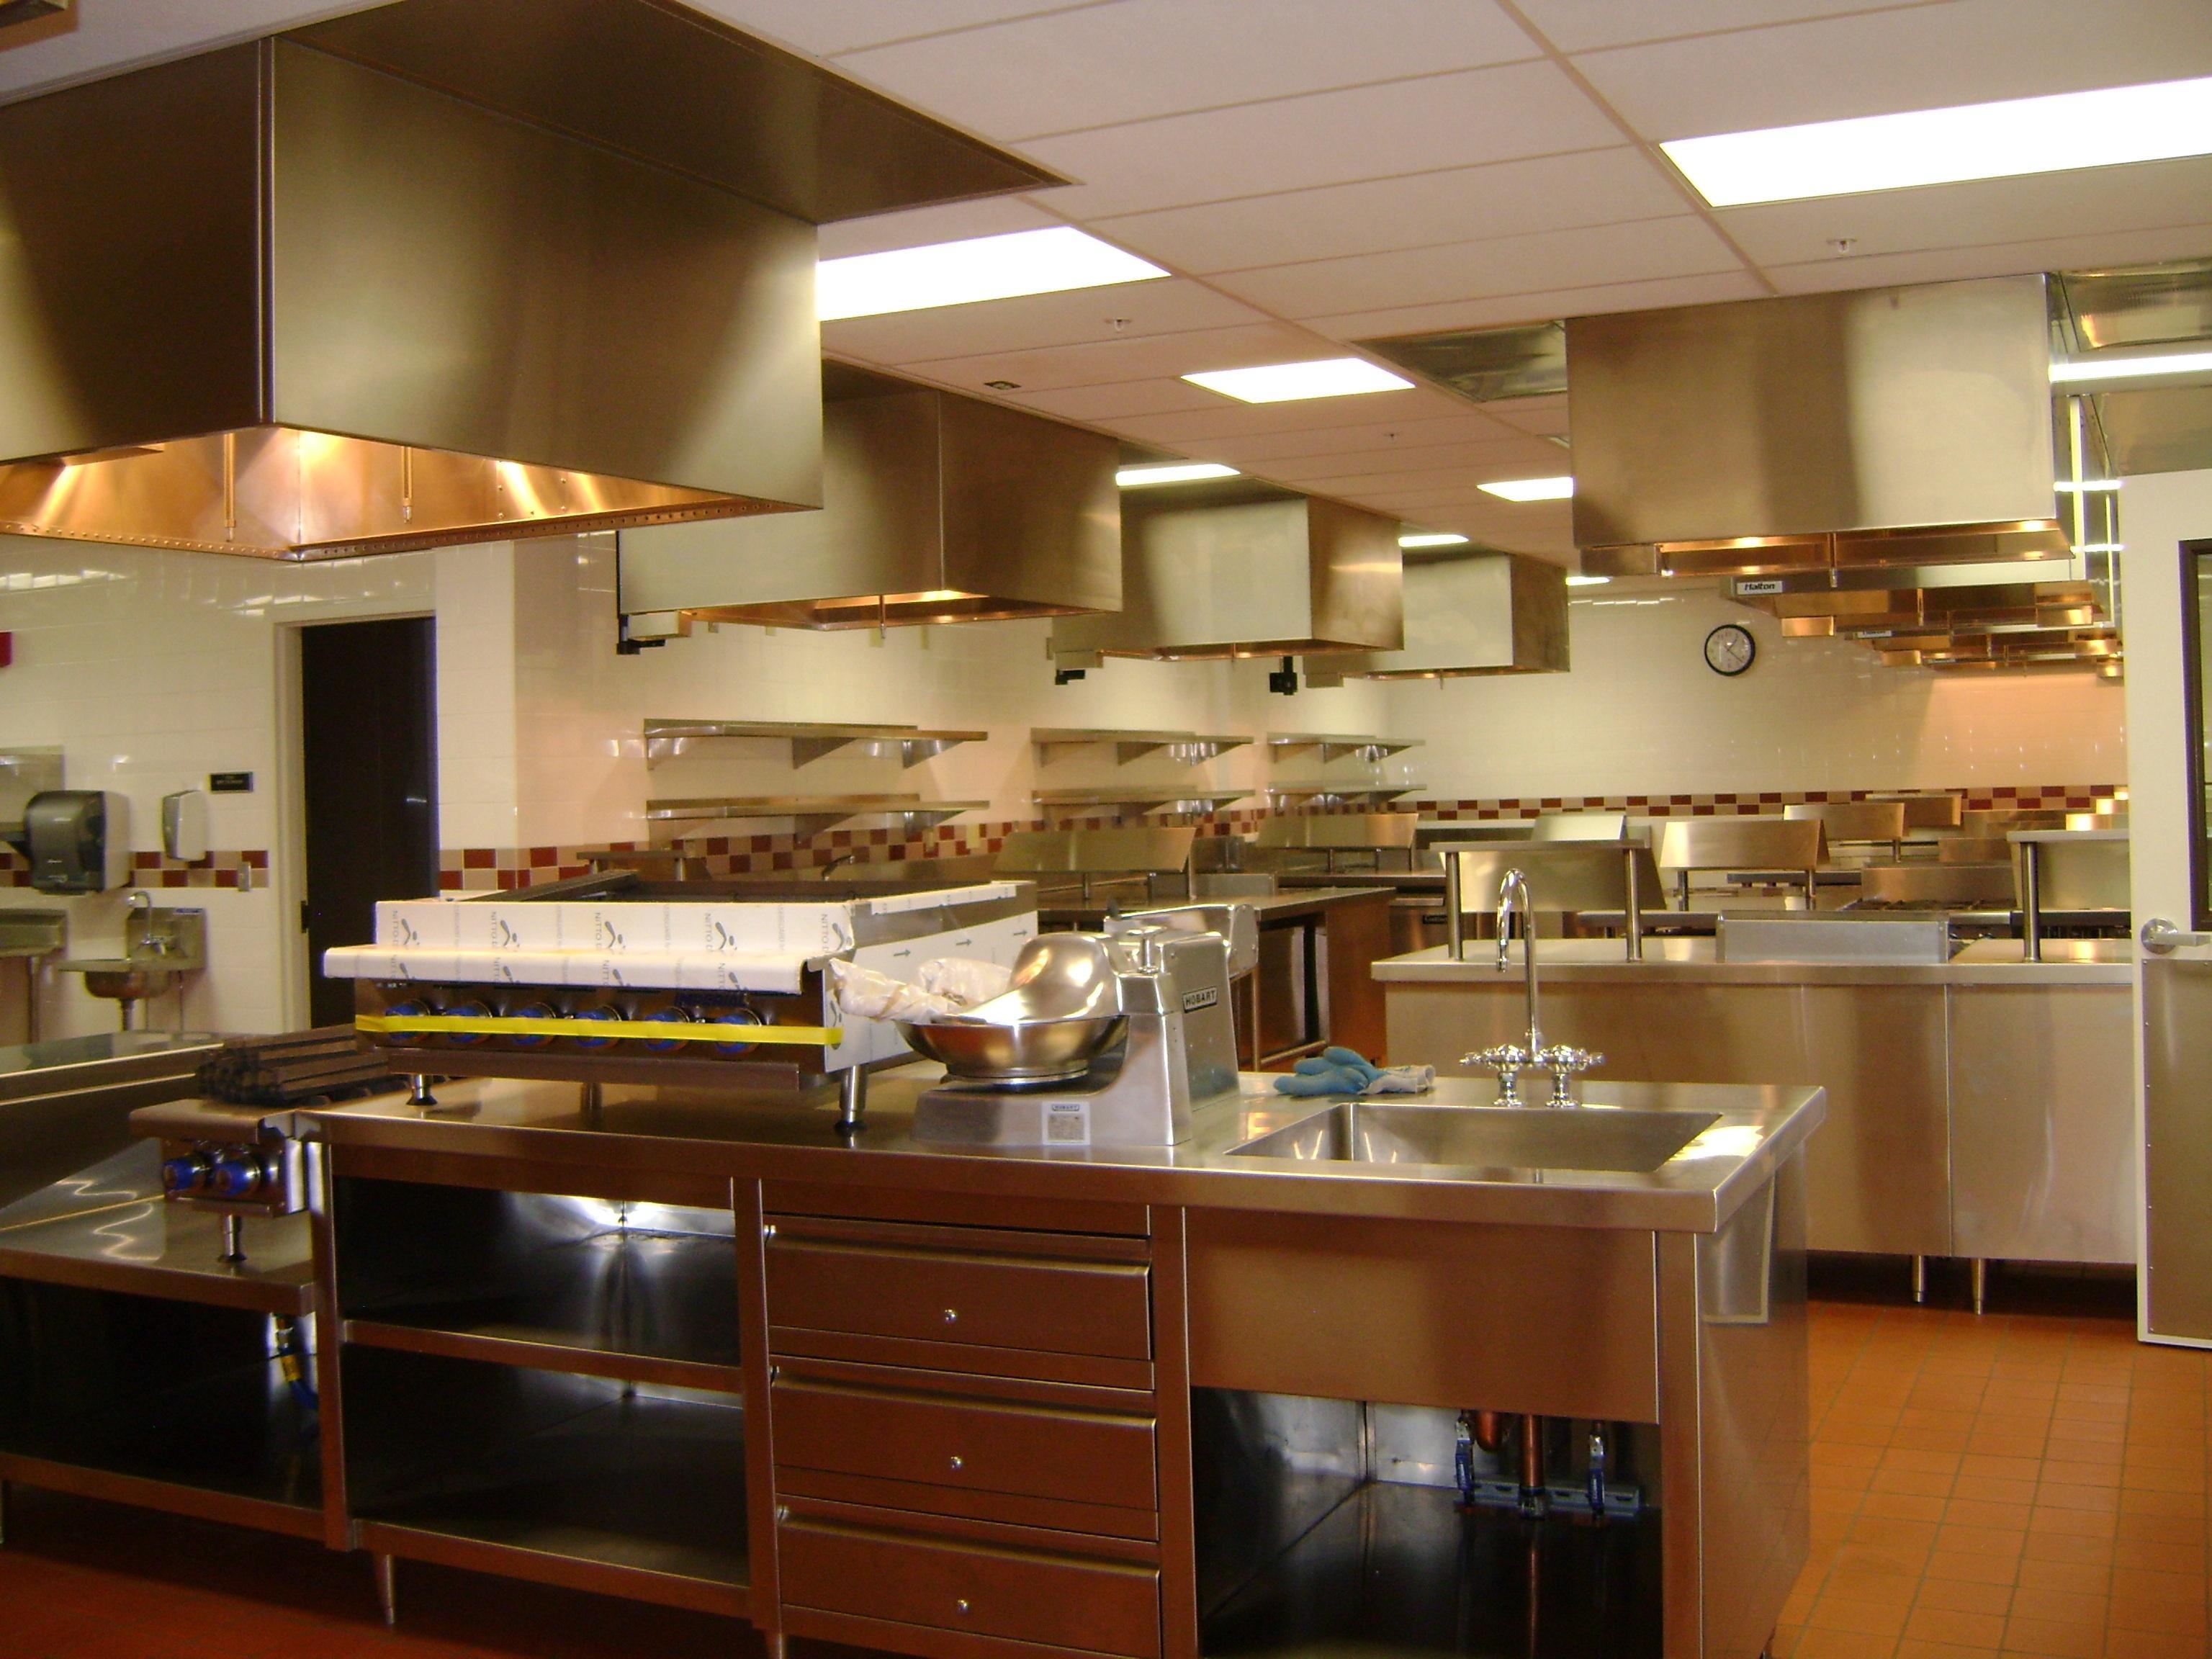 Fundamental Skills Learning Kitchens